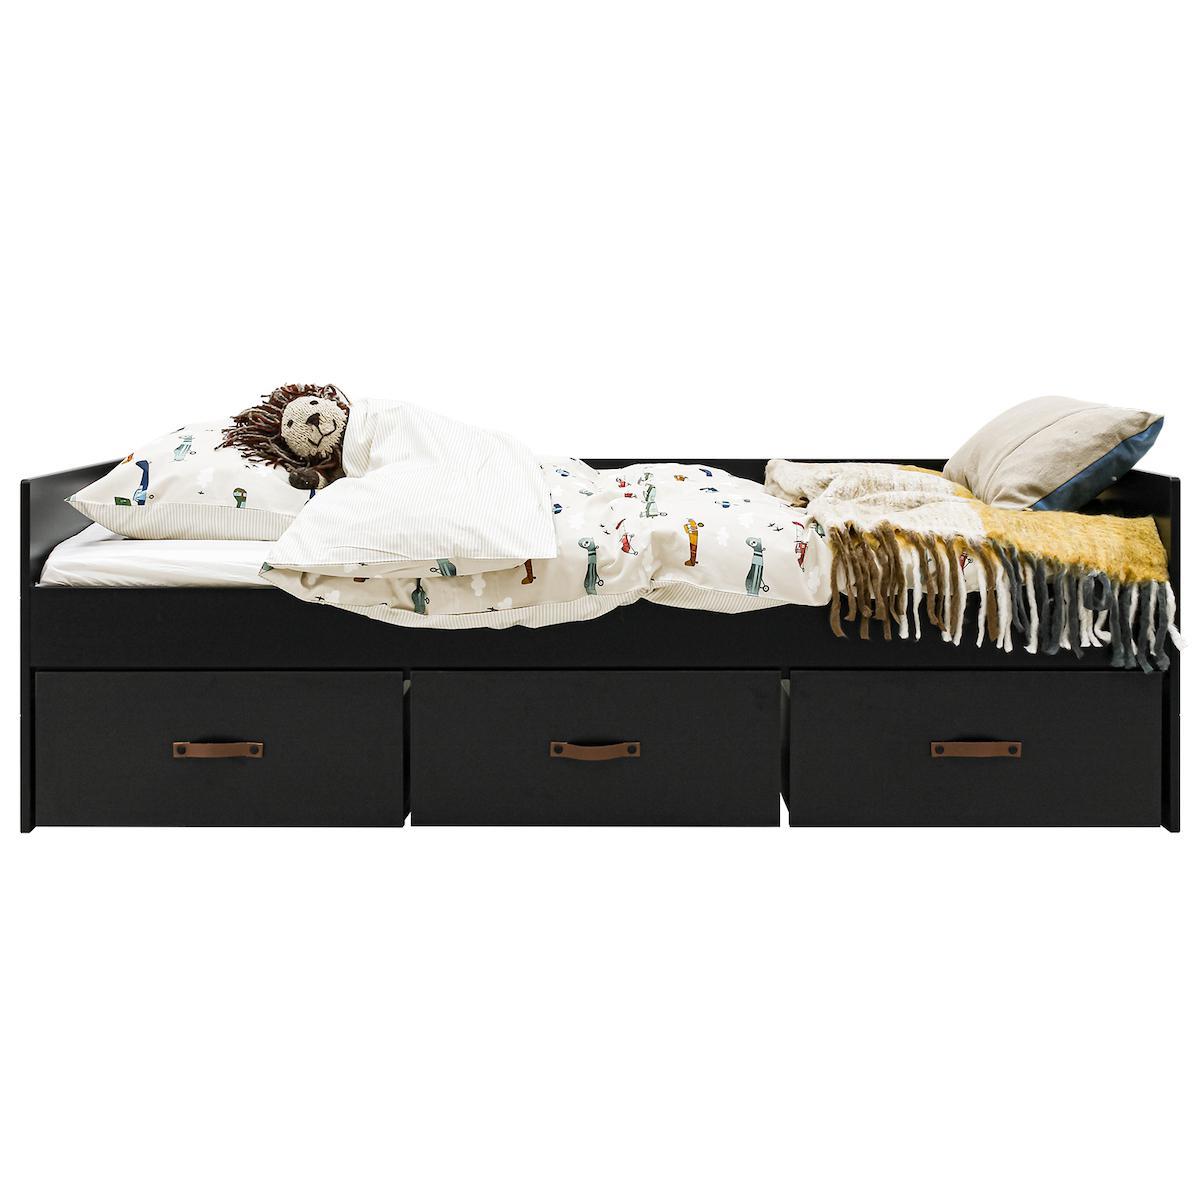 Cama-sofá 90x200cm 3 cajones FLORIS Bopita negro mate-natural